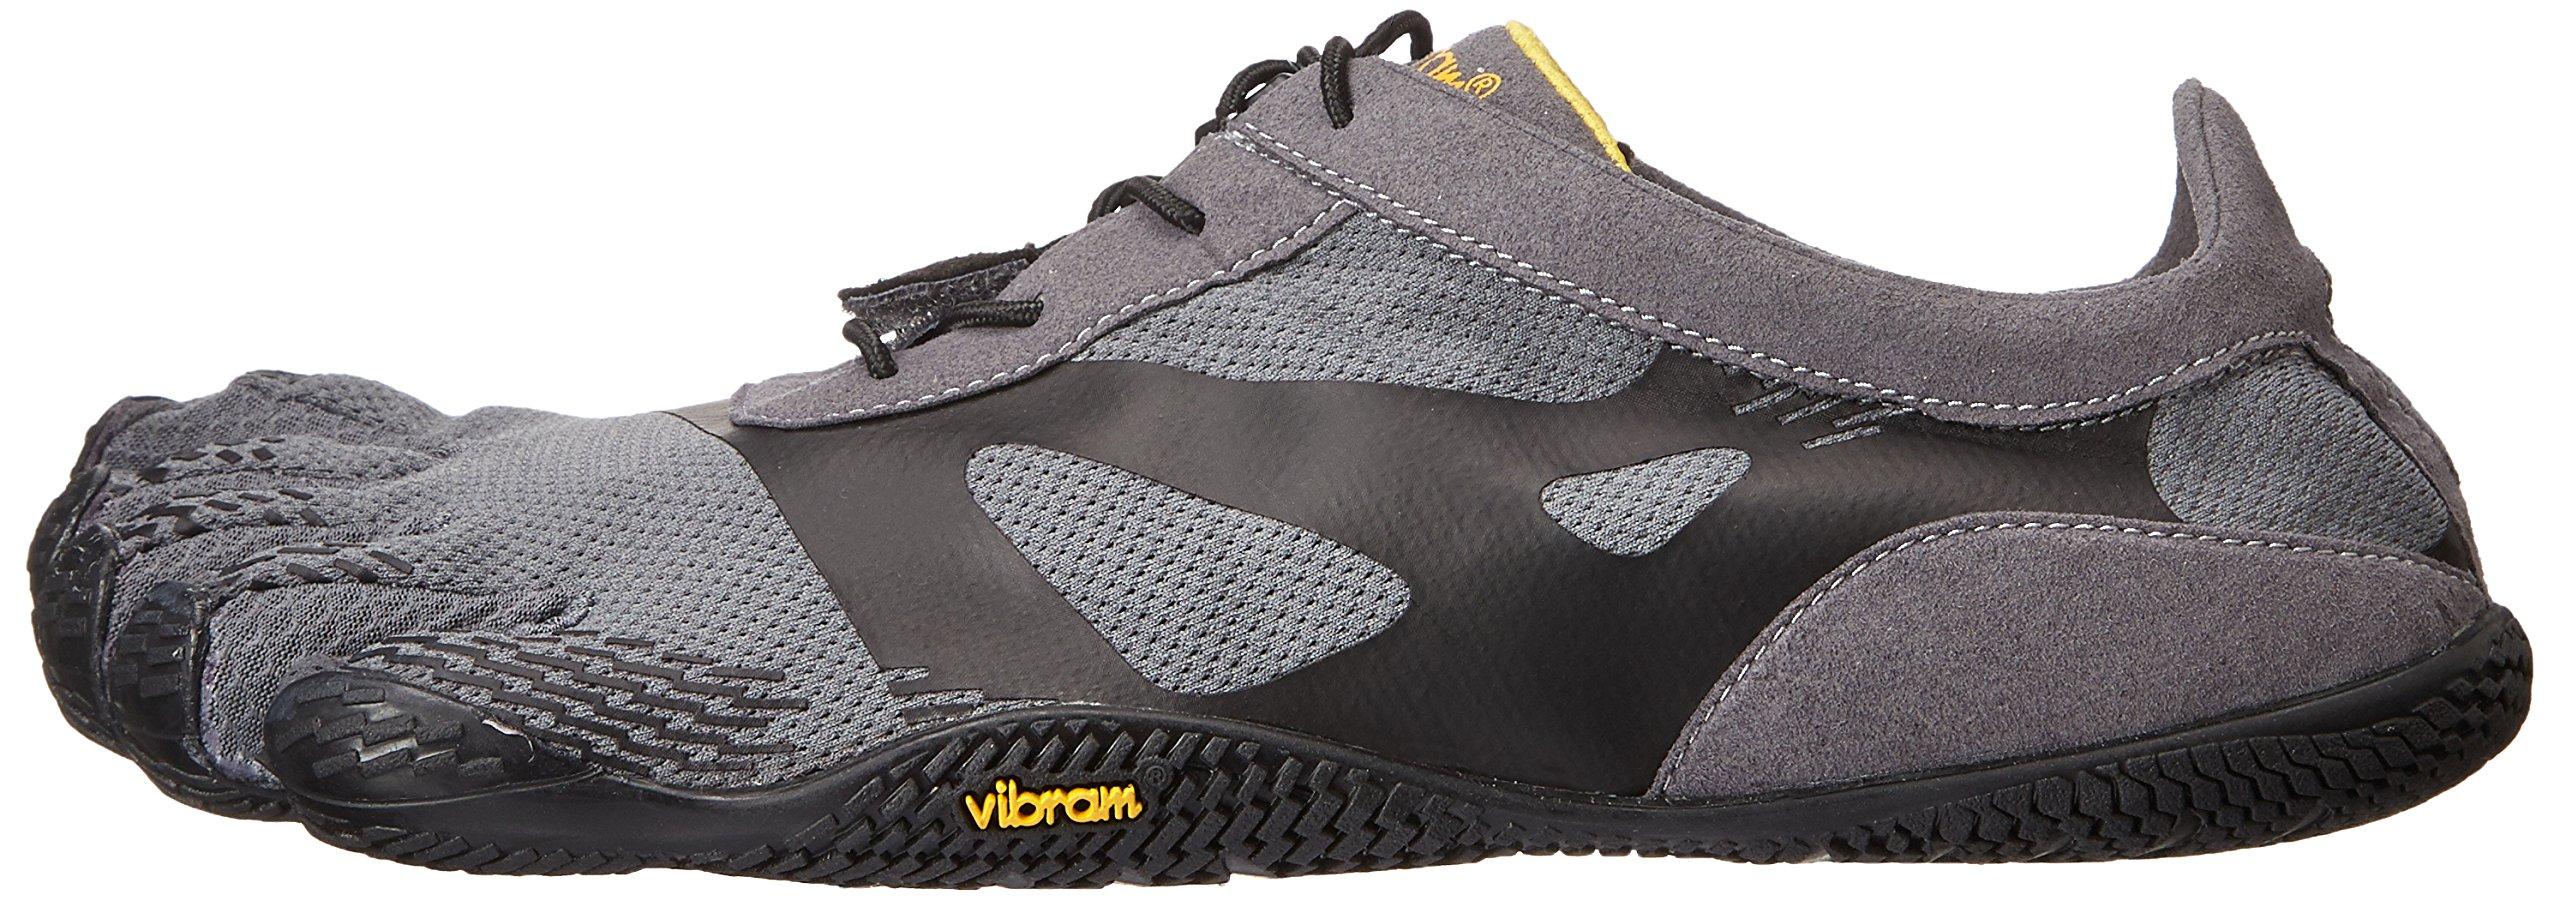 Vibram Men's KSO EVO Cross Training Shoe,Grey/Black,41 EU/8.5-9.0 M US by Vibram (Image #5)